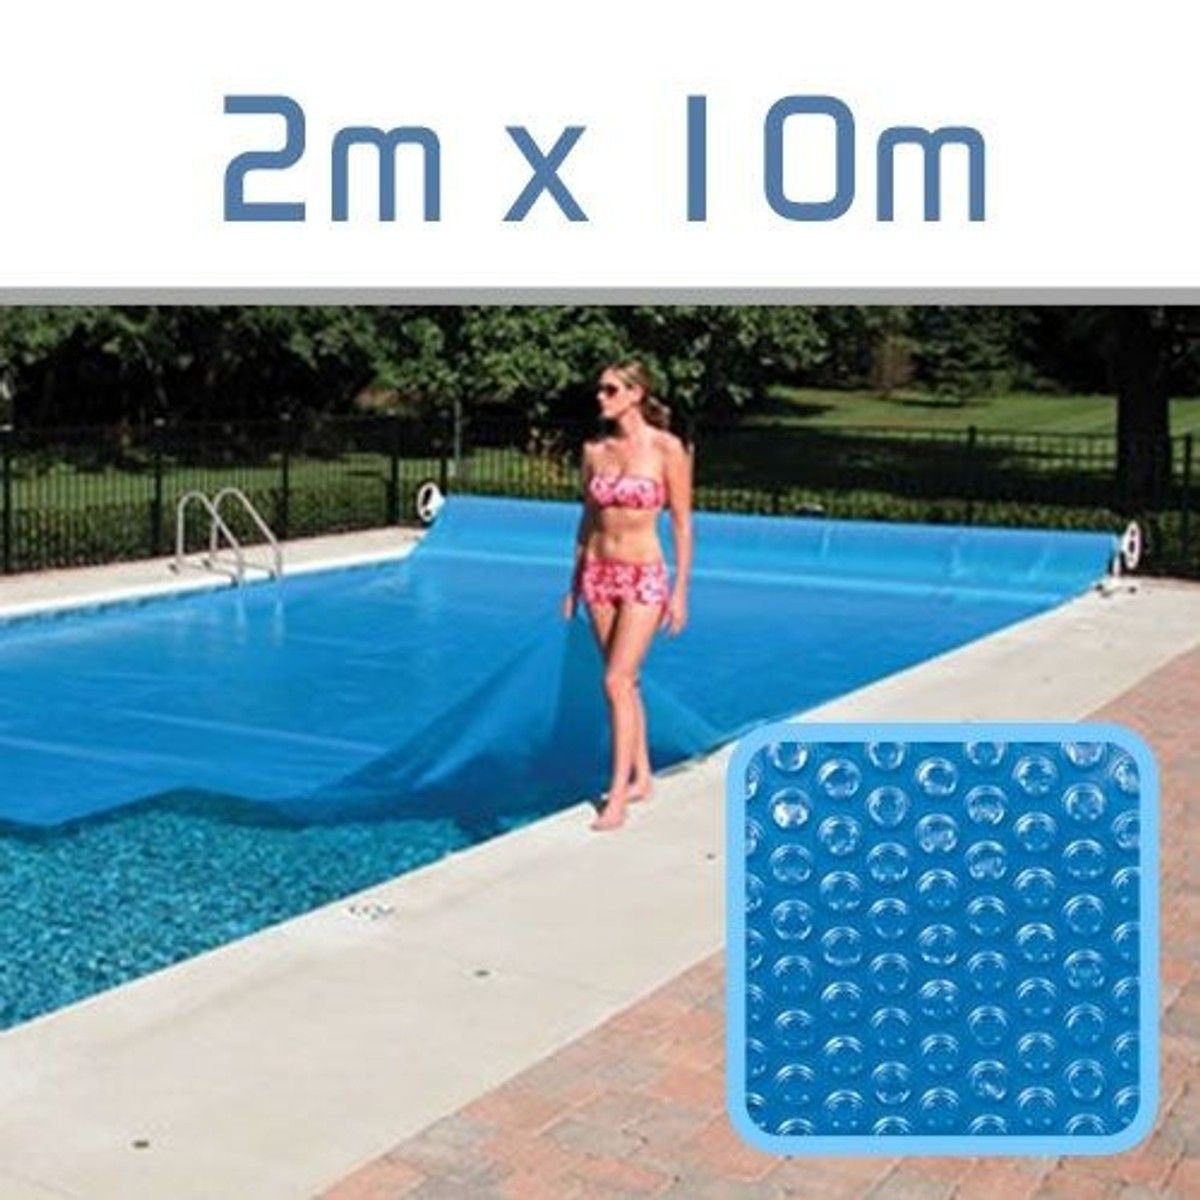 B che bulles 300 microns pour piscine 2m x 10m b che - Chauffer sa piscine avec tuyau noir ...